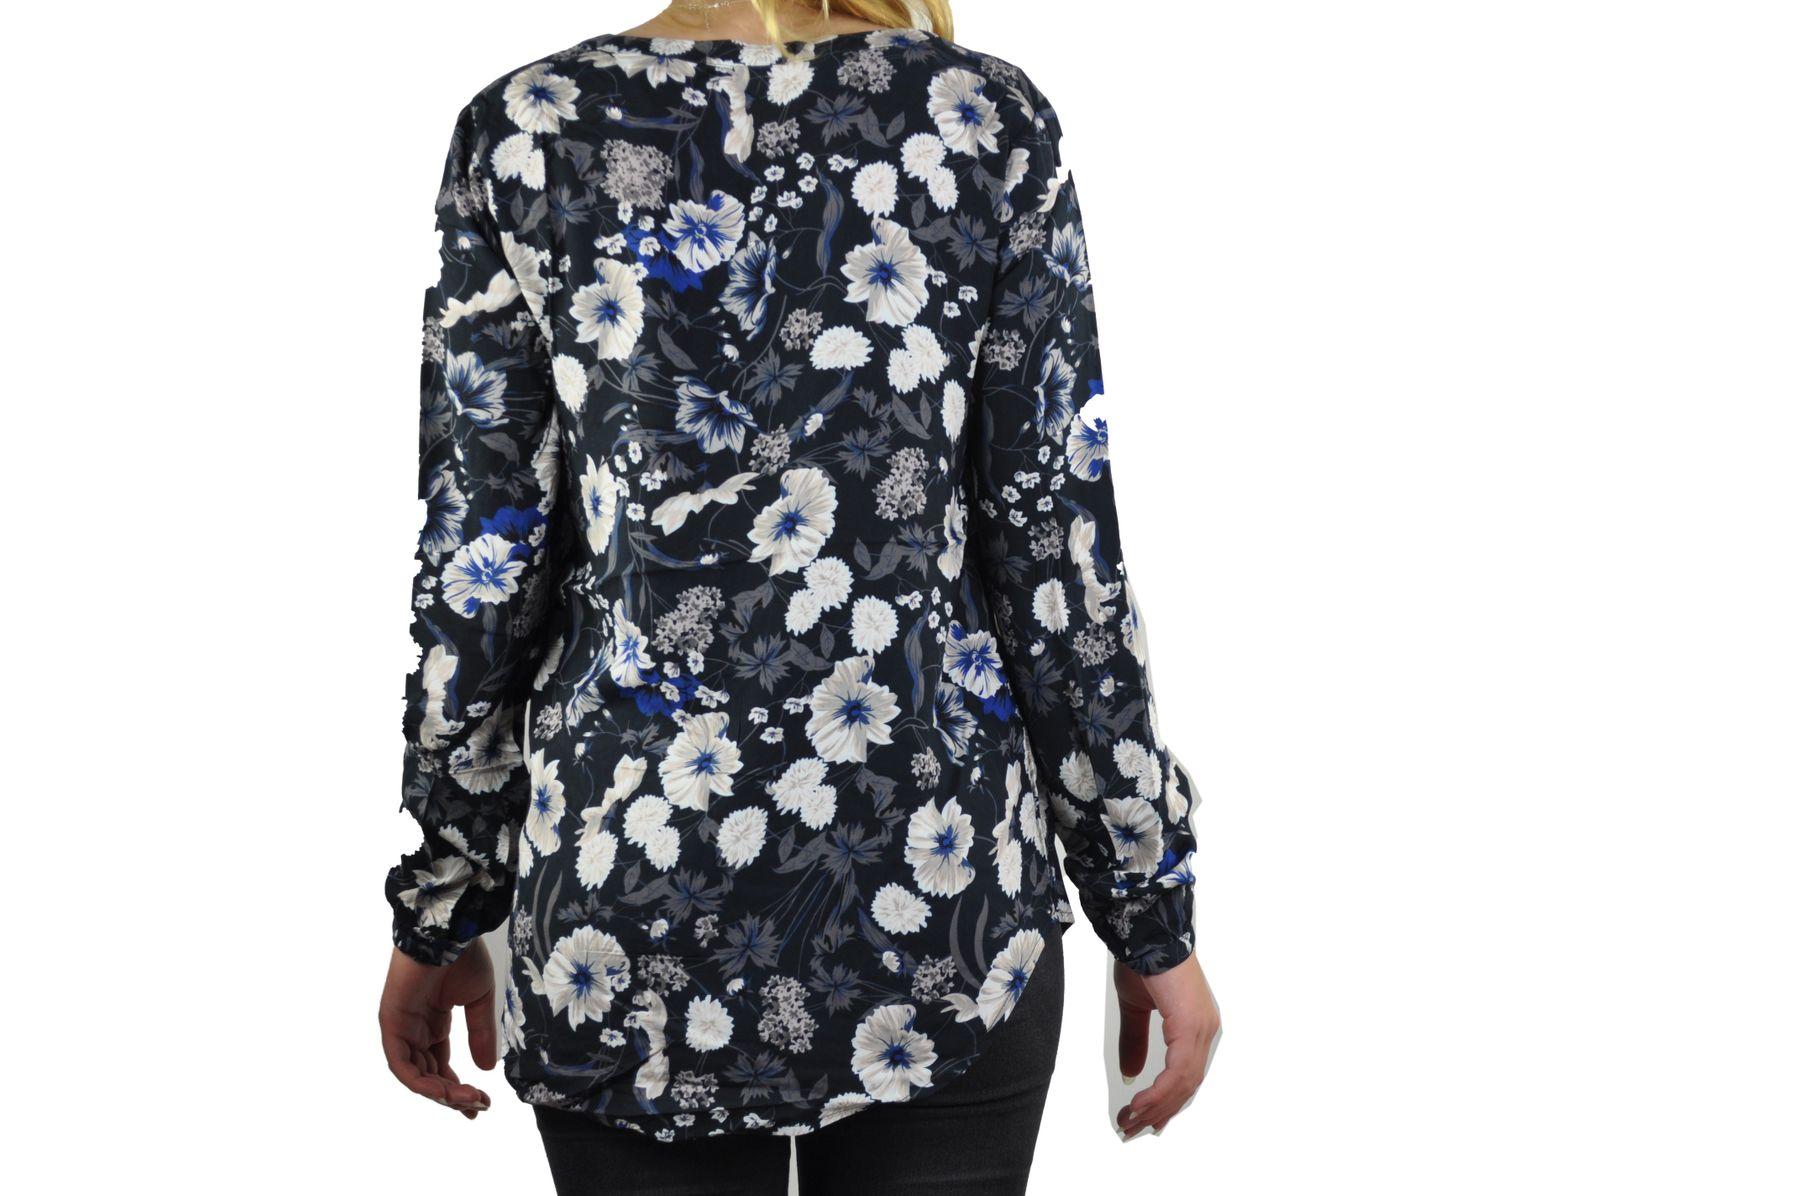 Soyaconcept - Damen Bluse mit Flower Muster, SC-Pammy 1 (14621-30) – Bild 9